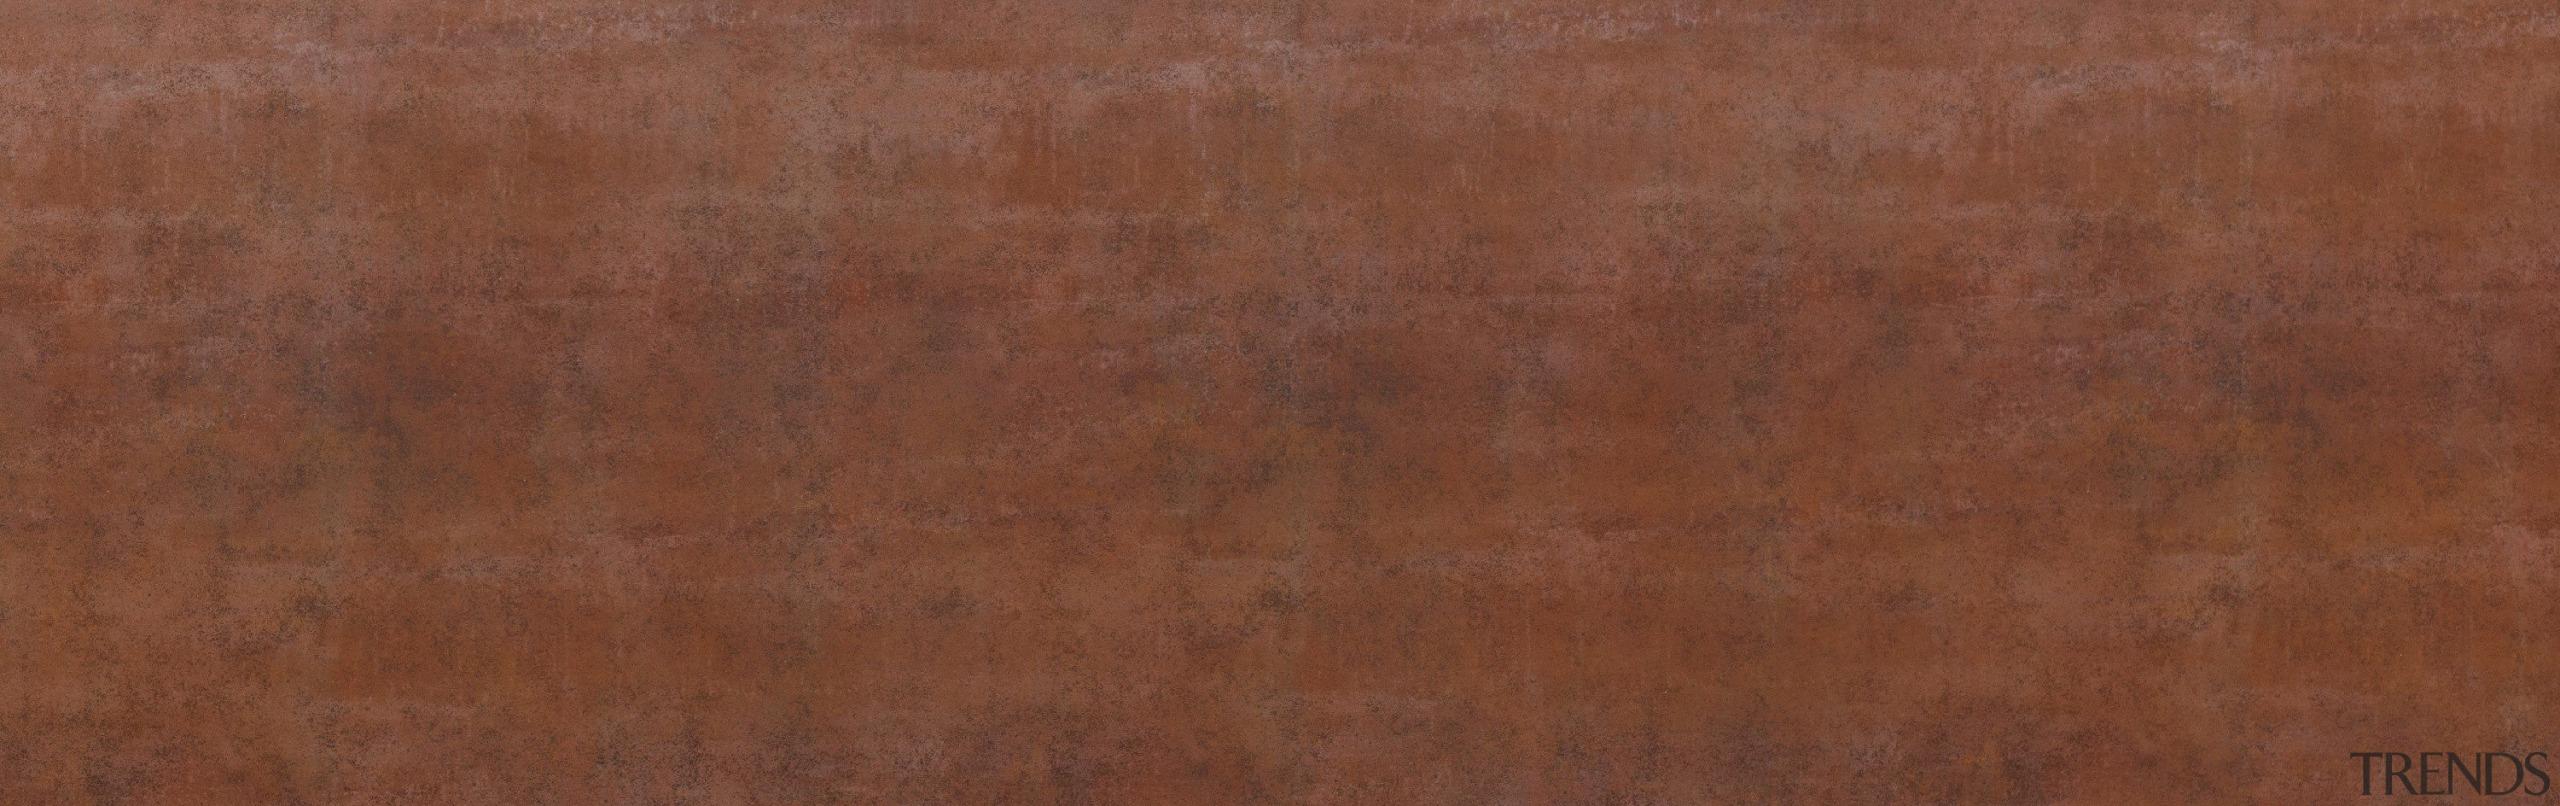 Iron Corten - Iron Corten - brown | brown, flooring, hardwood, laminate flooring, plywood, texture, wood, wood flooring, wood stain, brown